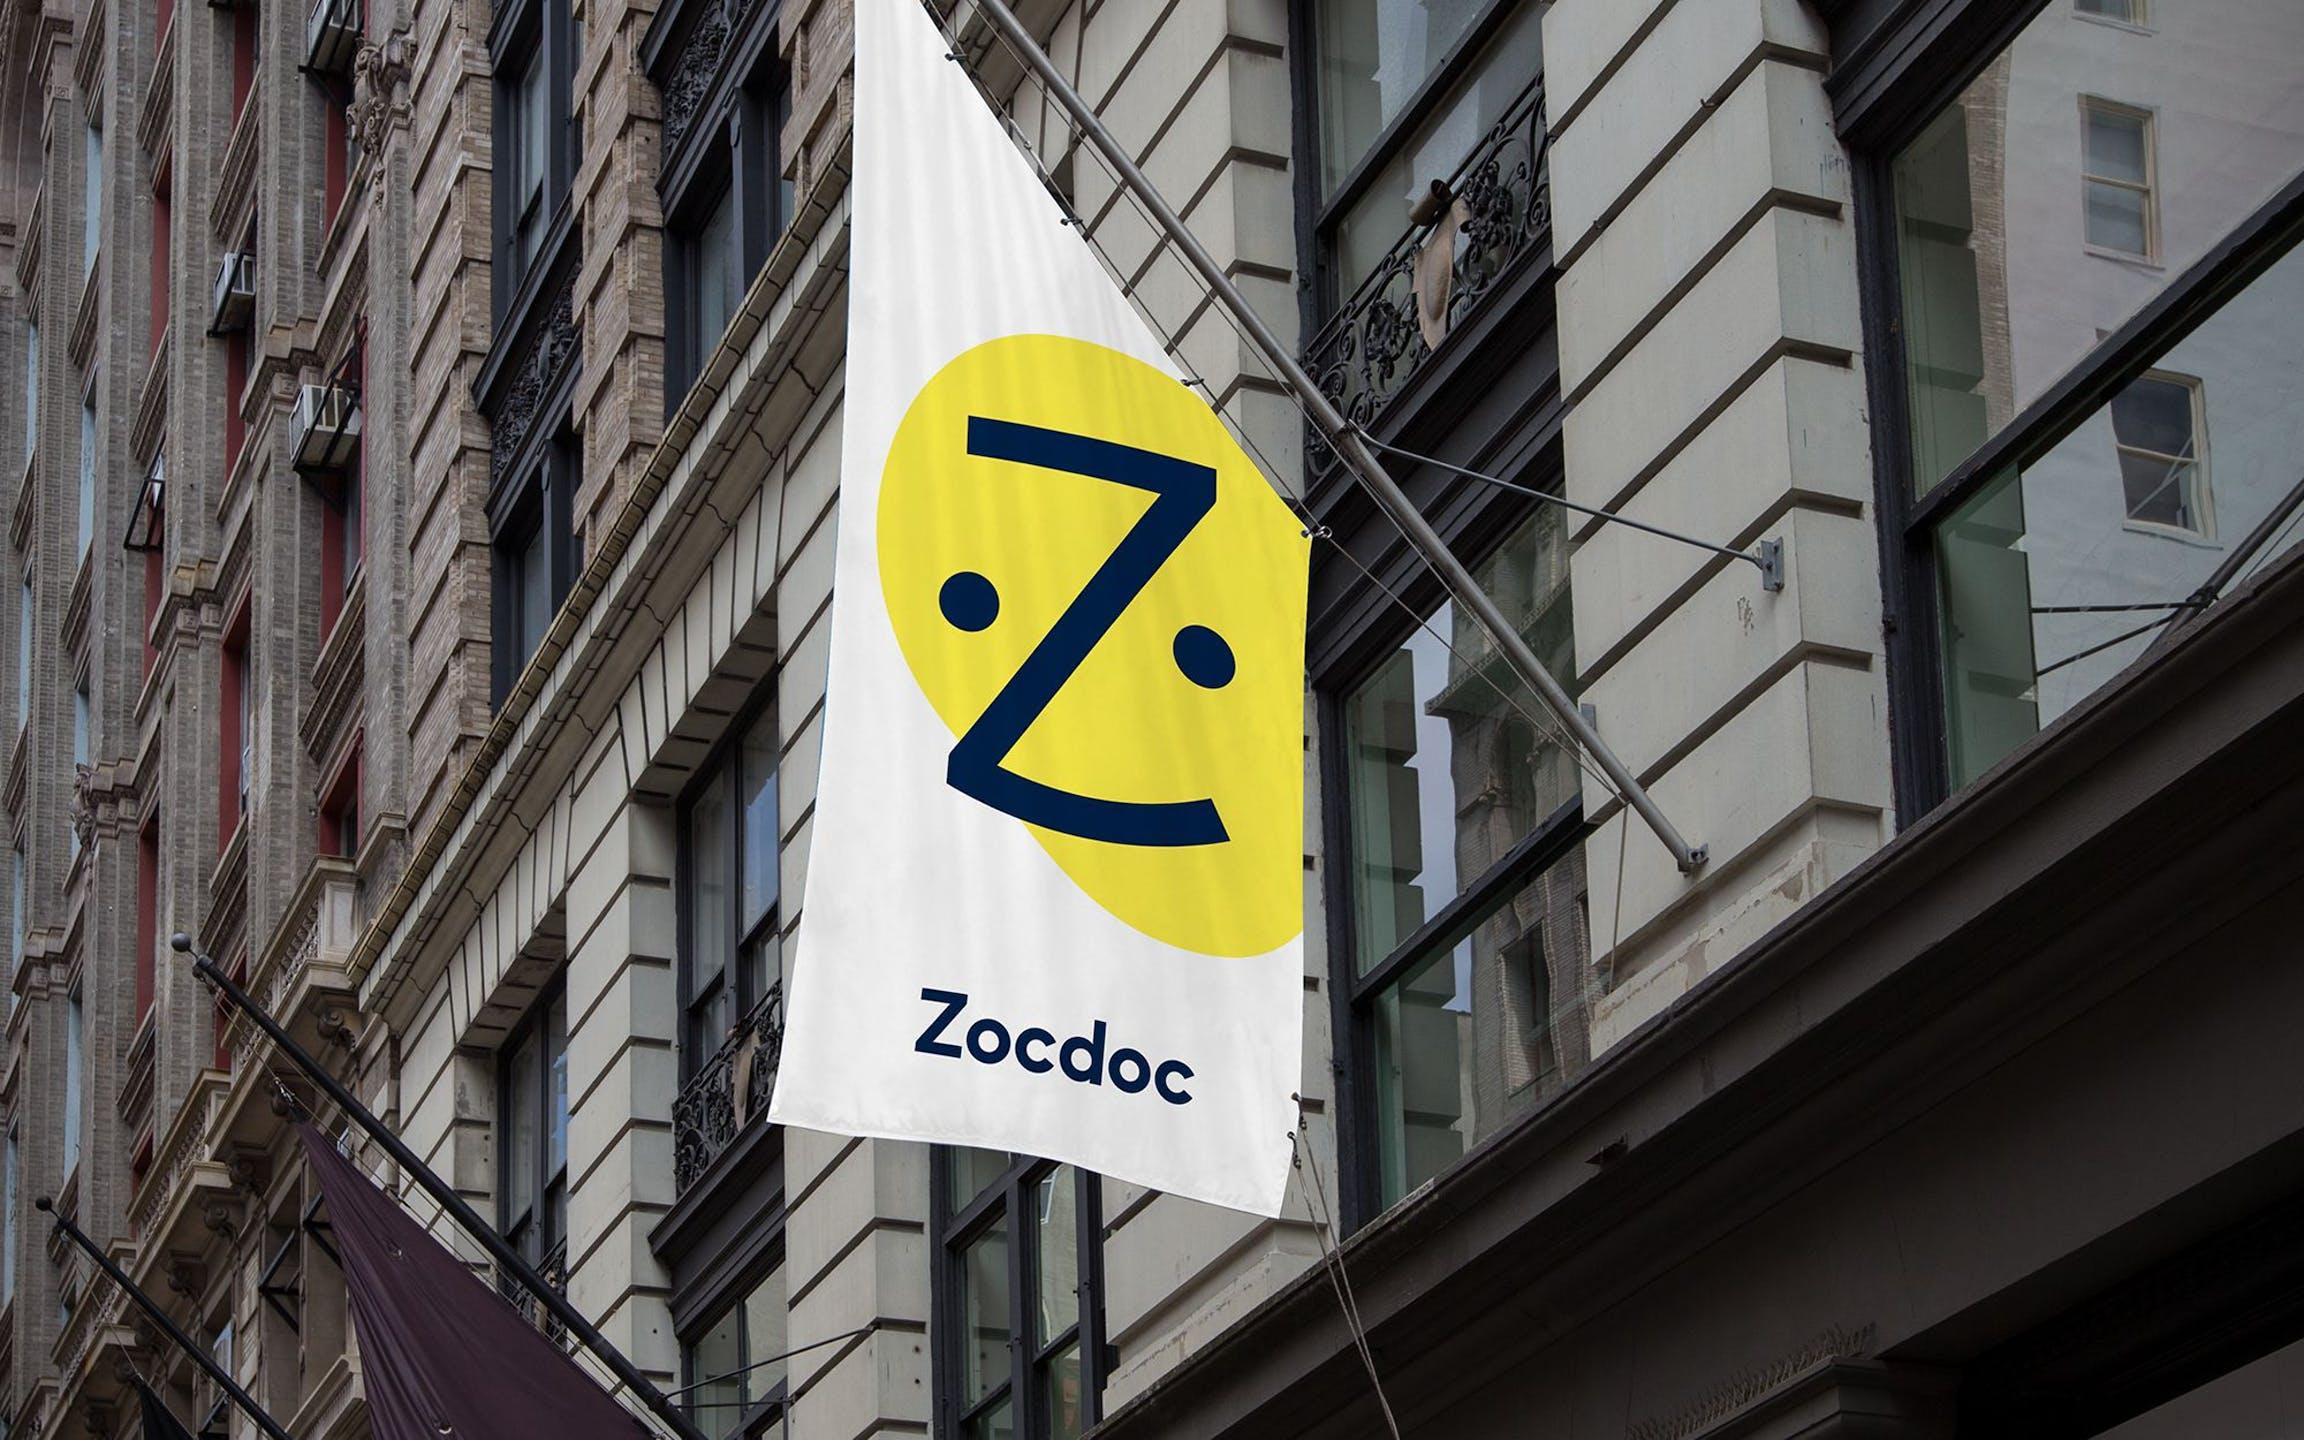 Zocdoc image